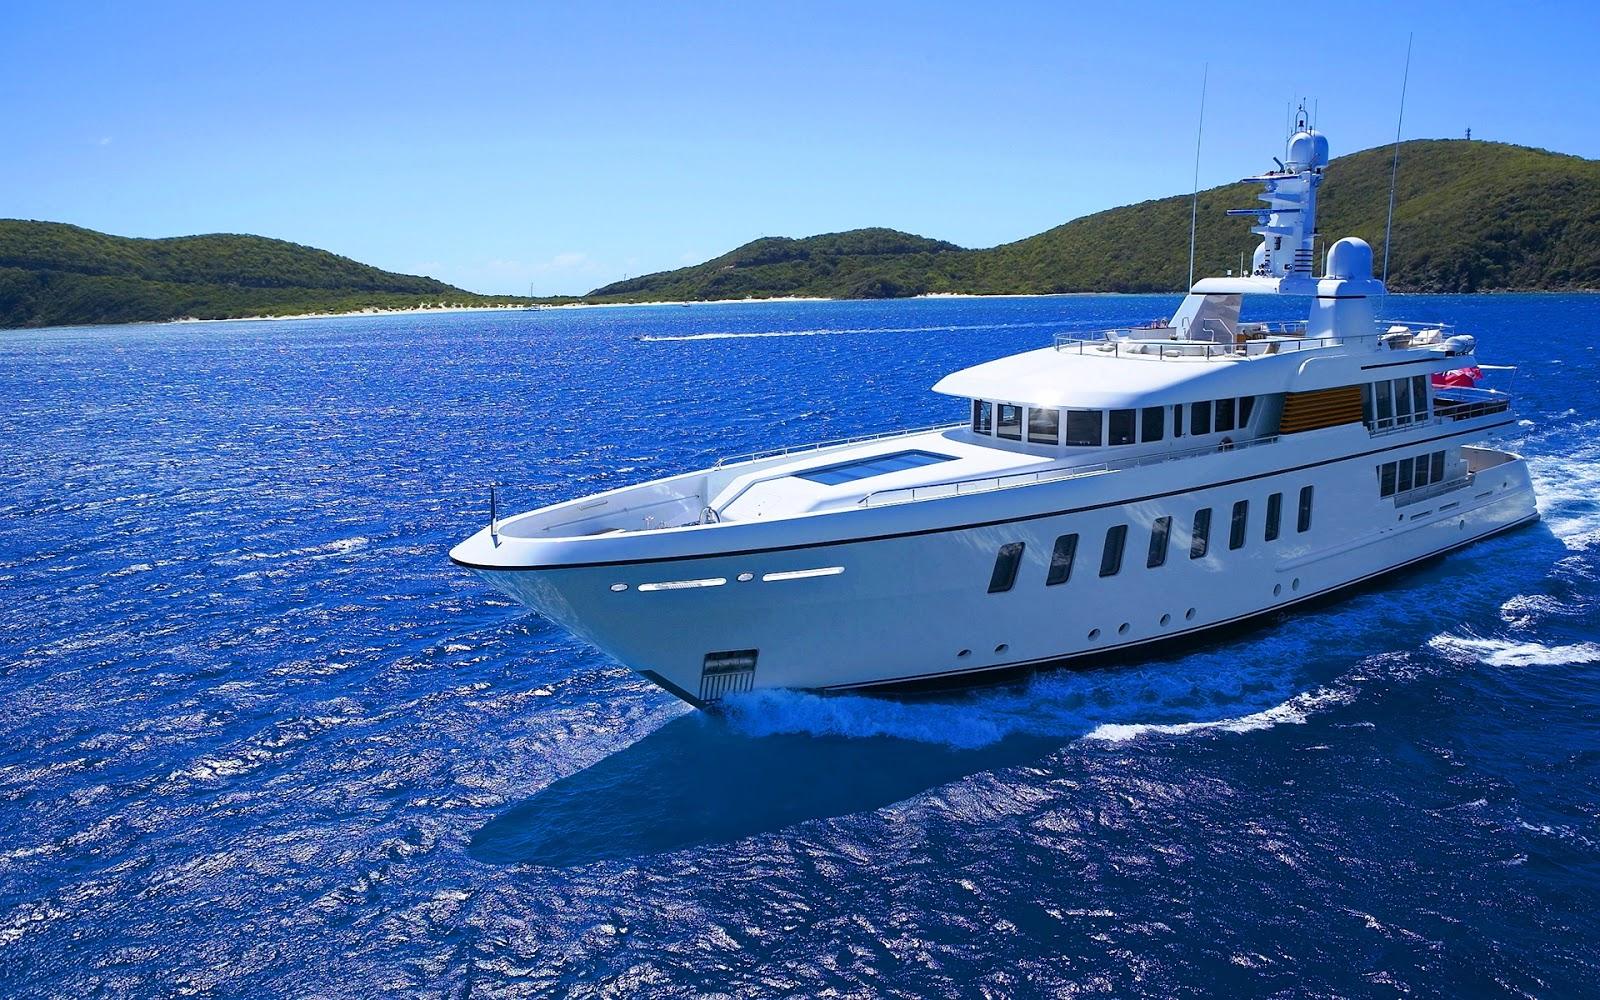 luxury super yacht wallpaper - photo #7